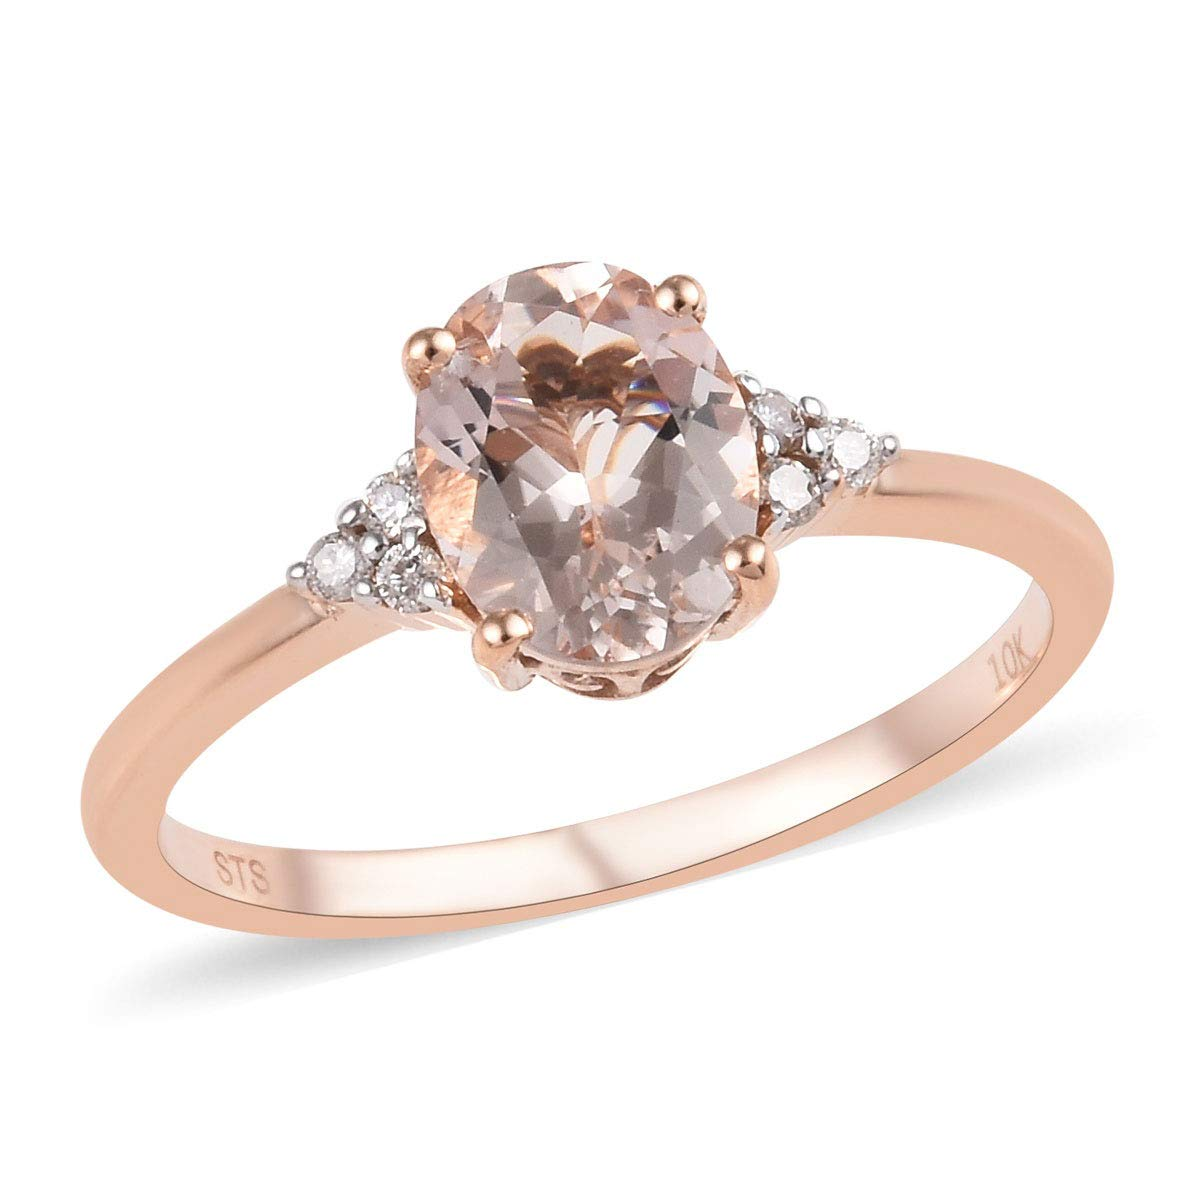 10K Rose Gold Rhodium Plated Premium Morganite Diamond Ring Jewelry for Women Ct 1.4 G-H Color I3